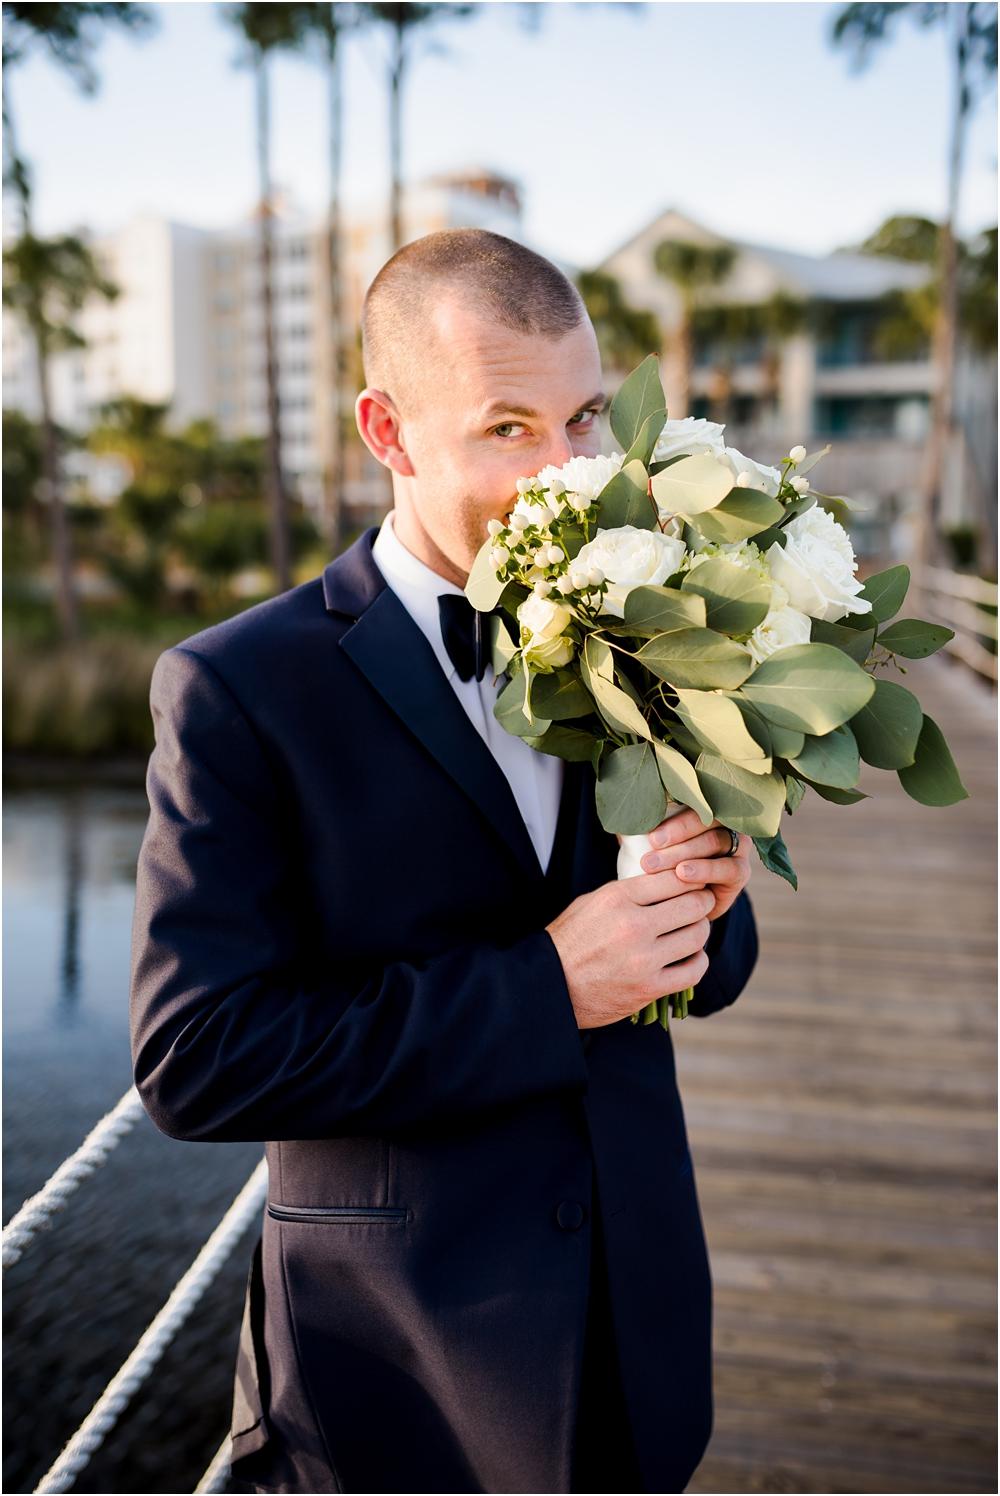 wilkins-sheraton-panama-city-beach-florida-wedding-dothan-tallahassee-kiersten-stevenson-photography-140.jpg